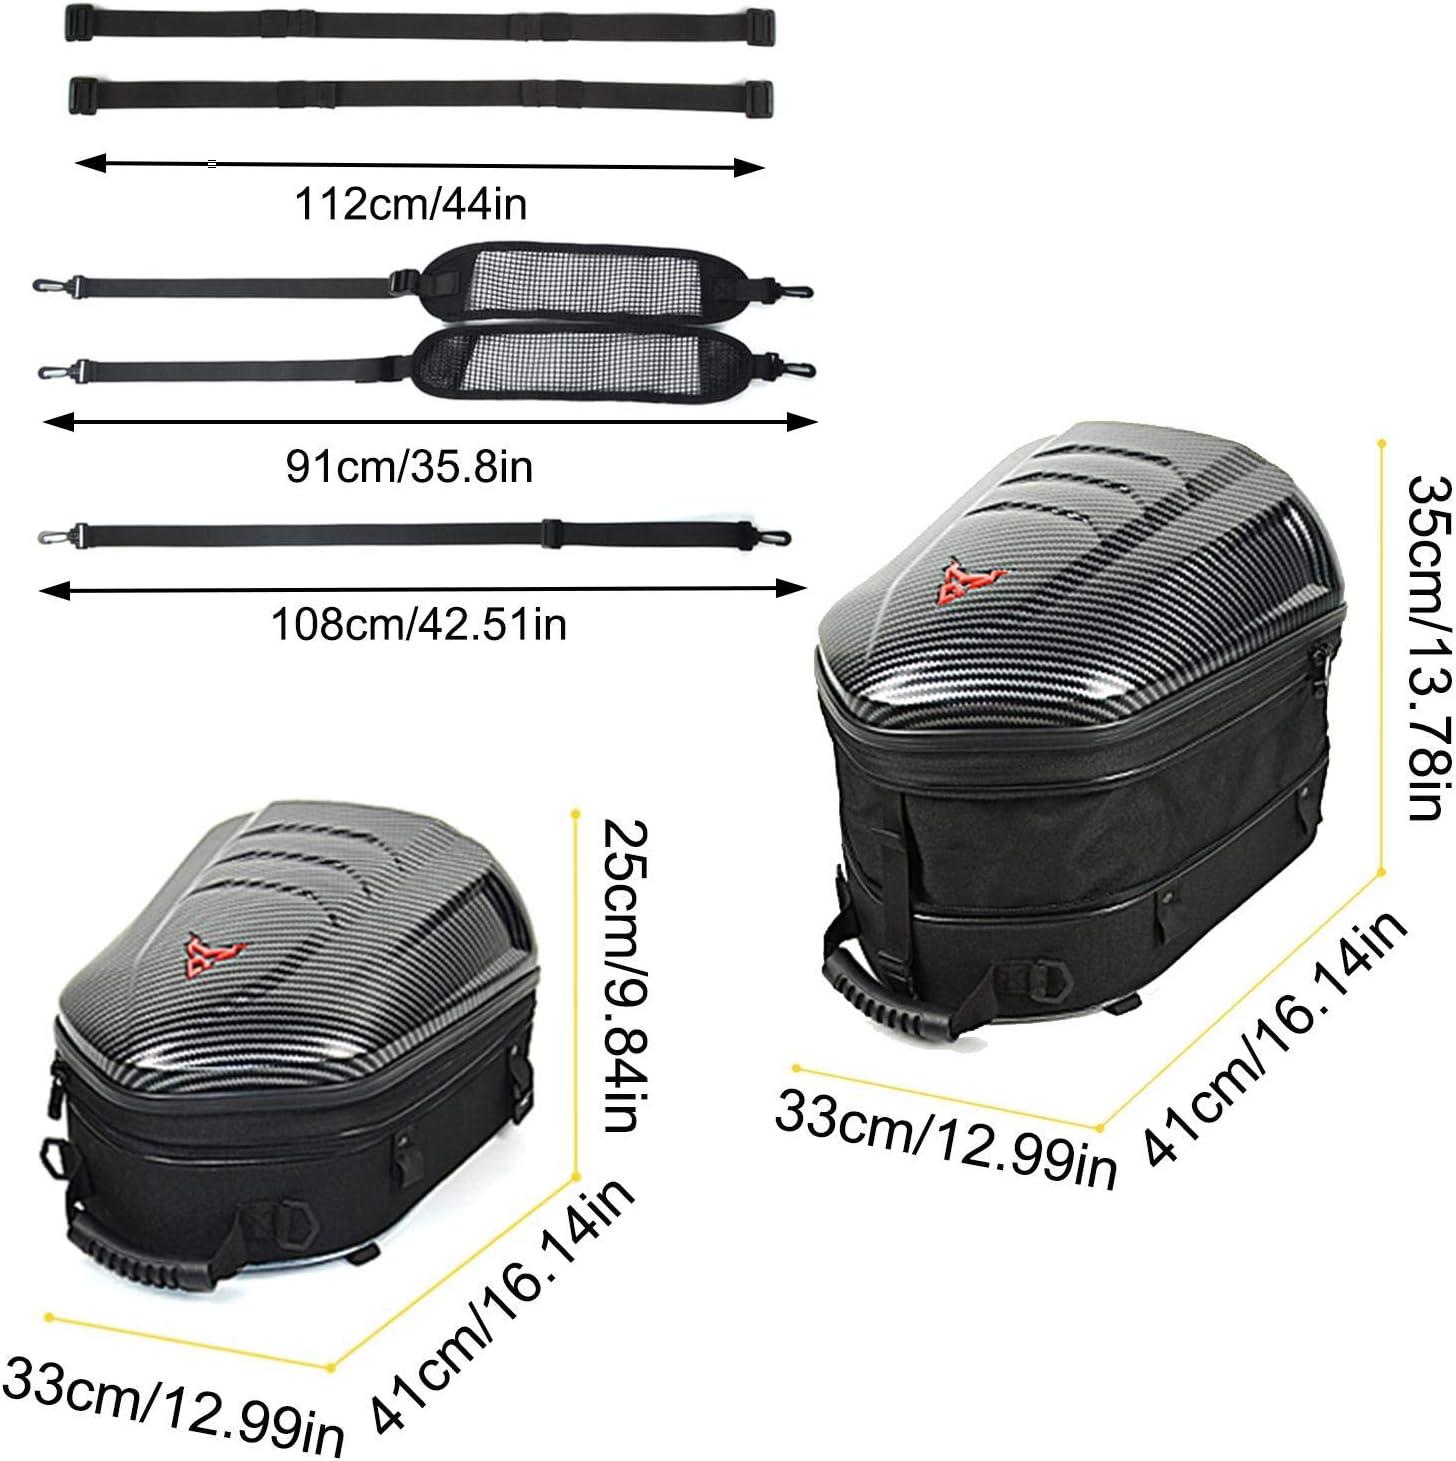 Motorcycle Seat Bag Tail Bag,Dual Use Motorcycle Backpack,ABS Shell Waterproof Luggage Bags,360-degree High-Brightness Reflections Motorbike Helmet Bag